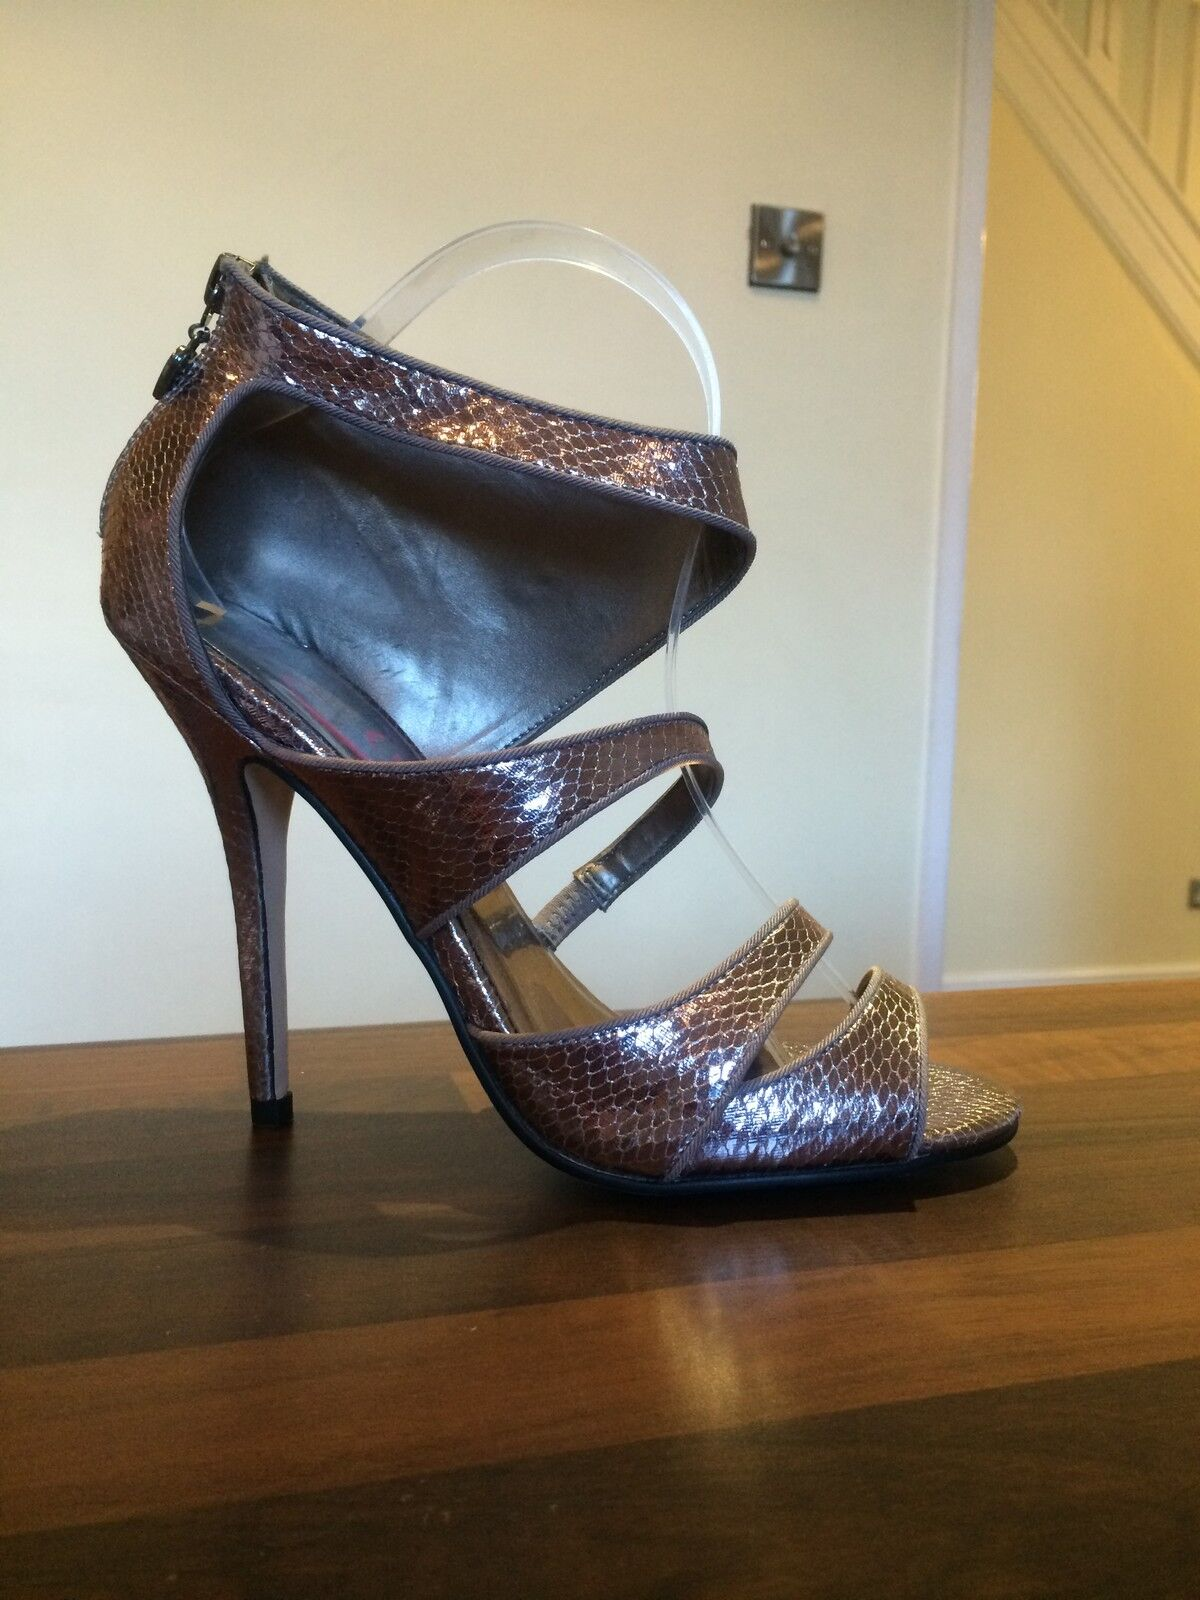 LIPSY Silver Gunmetal Metallic StrappyHigh Heels Peep Toe shoes Size 40 UK7